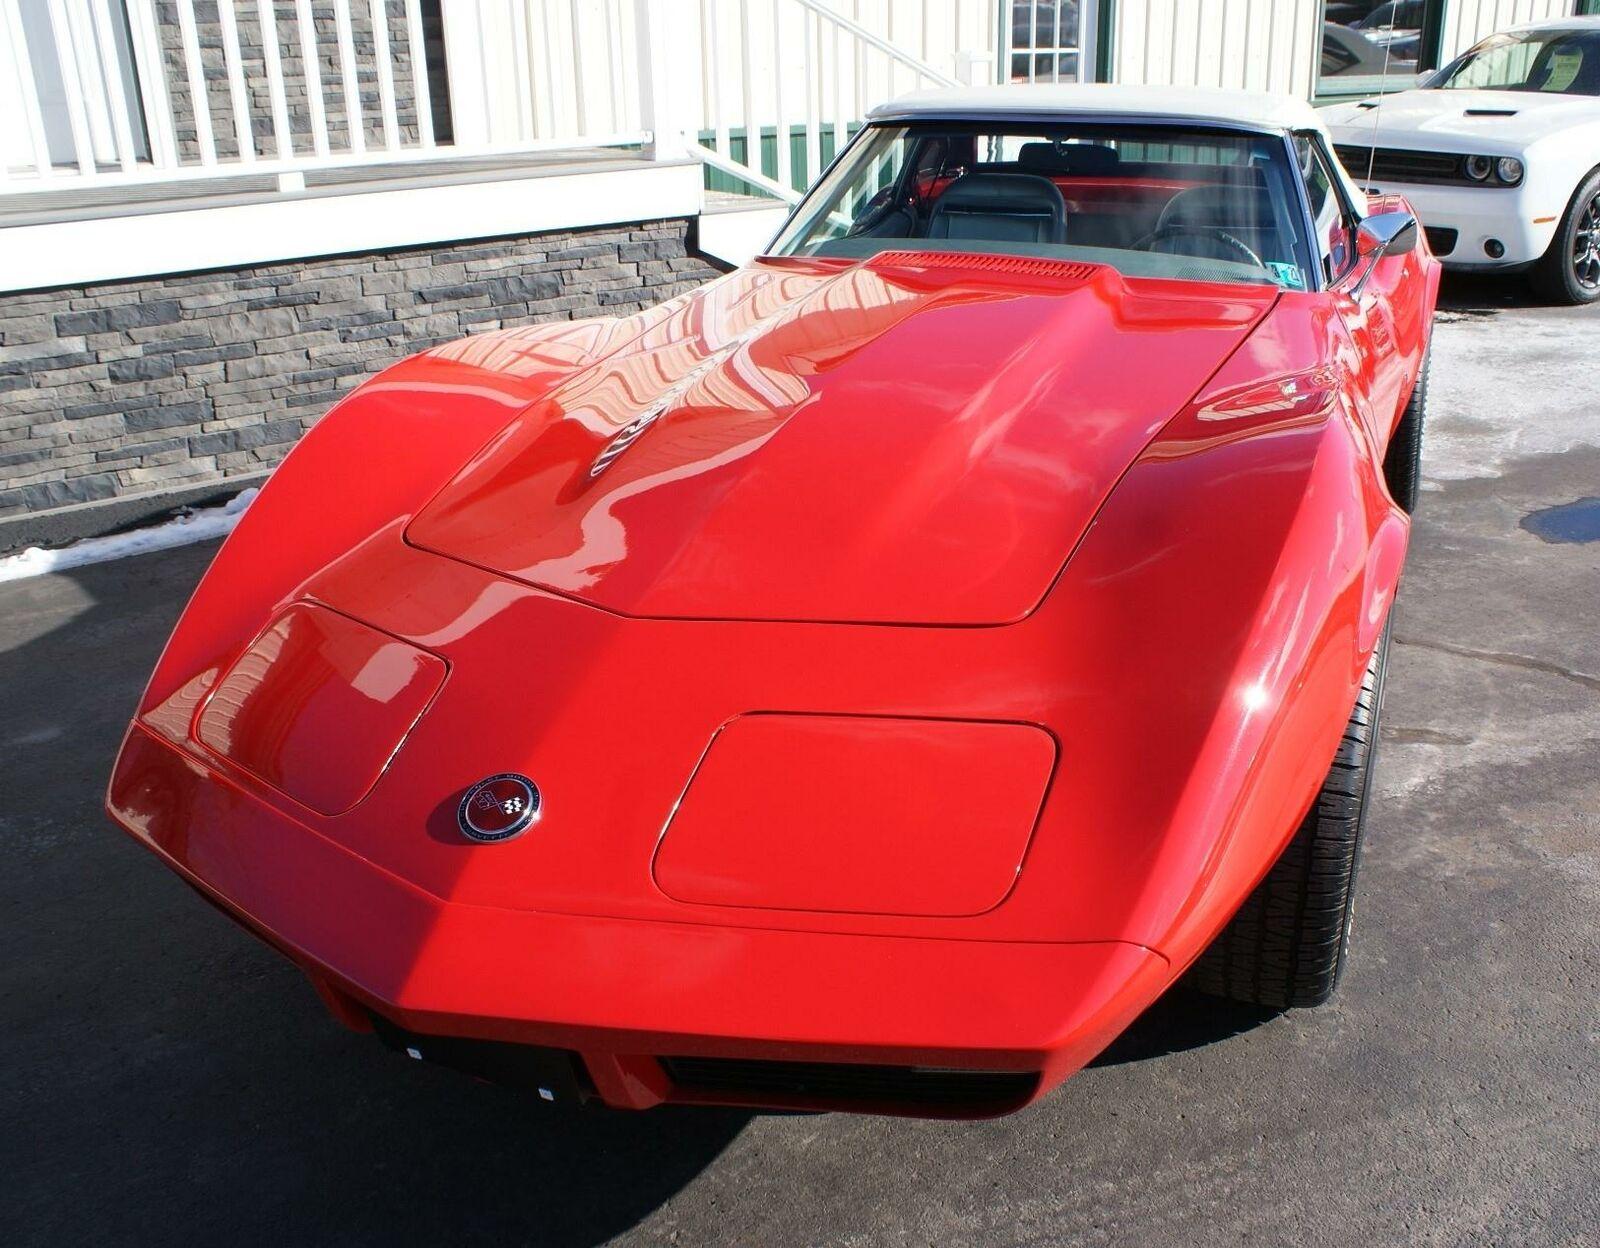 1974 Red Chevrolet Corvette  L82   C3 Corvette Photo 3